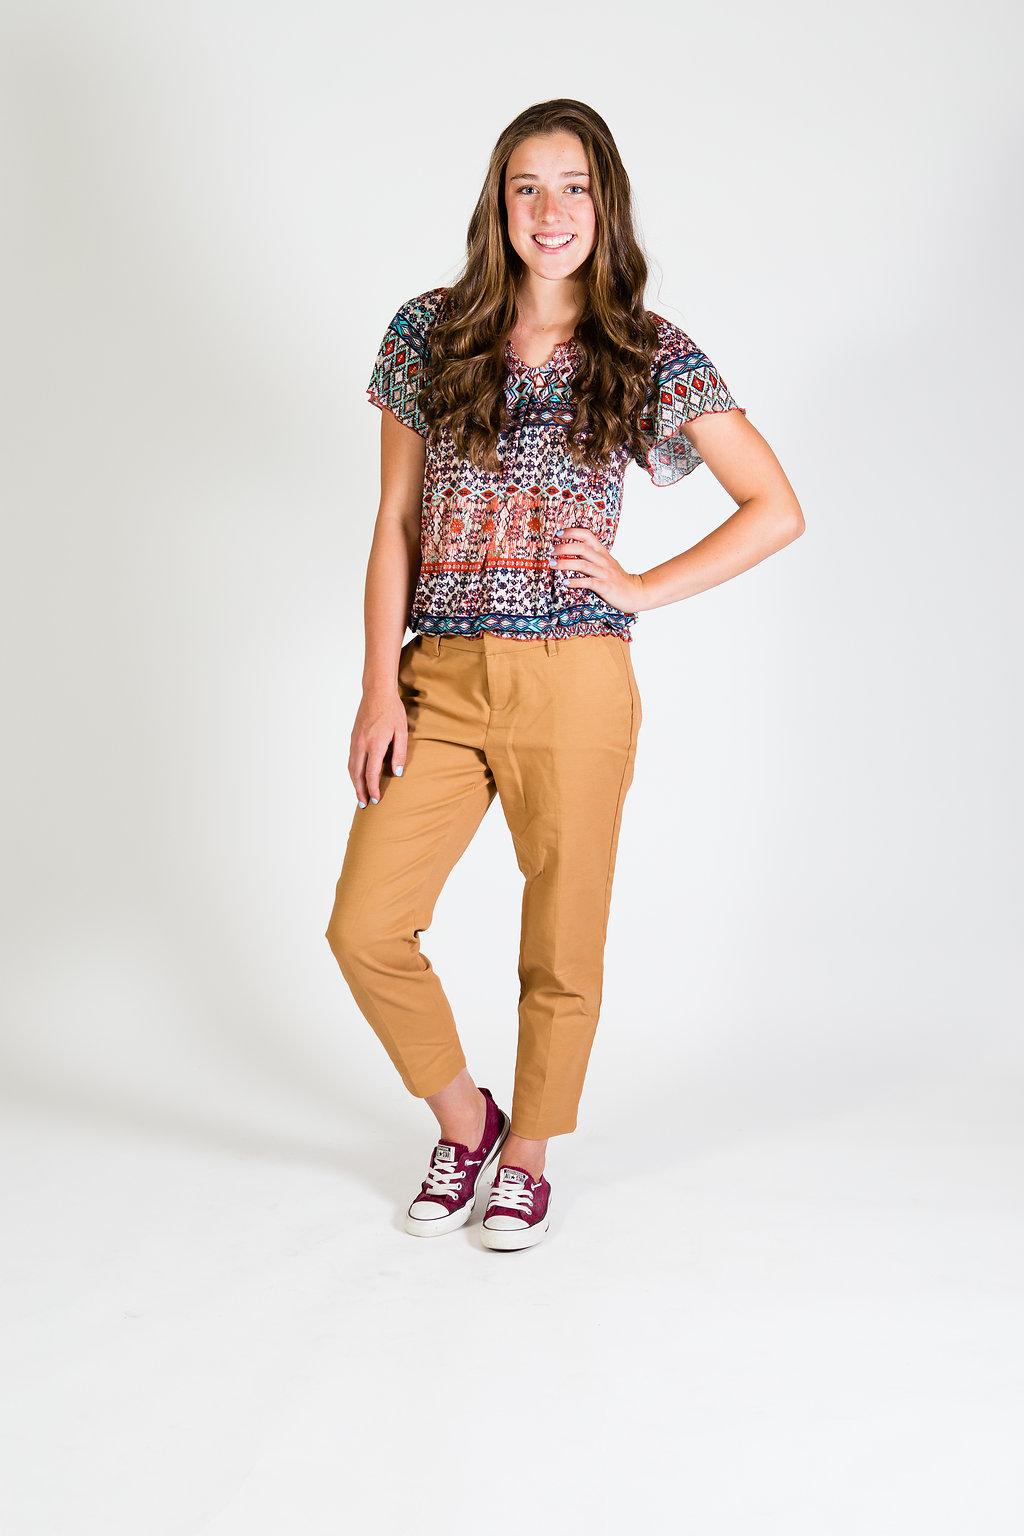 16JuneWCA_Uniforms175-Edit.jpg